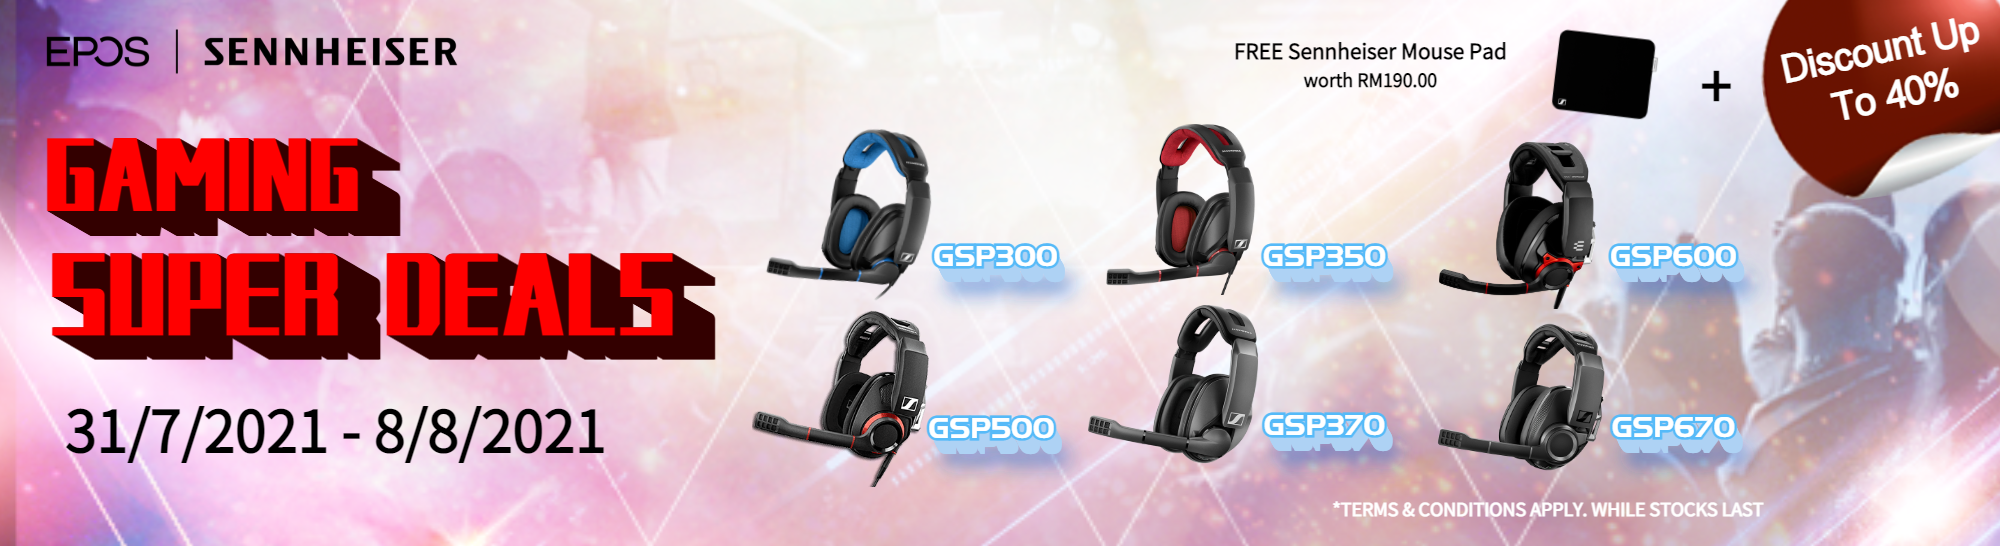 EPOS Gaming Super Deals